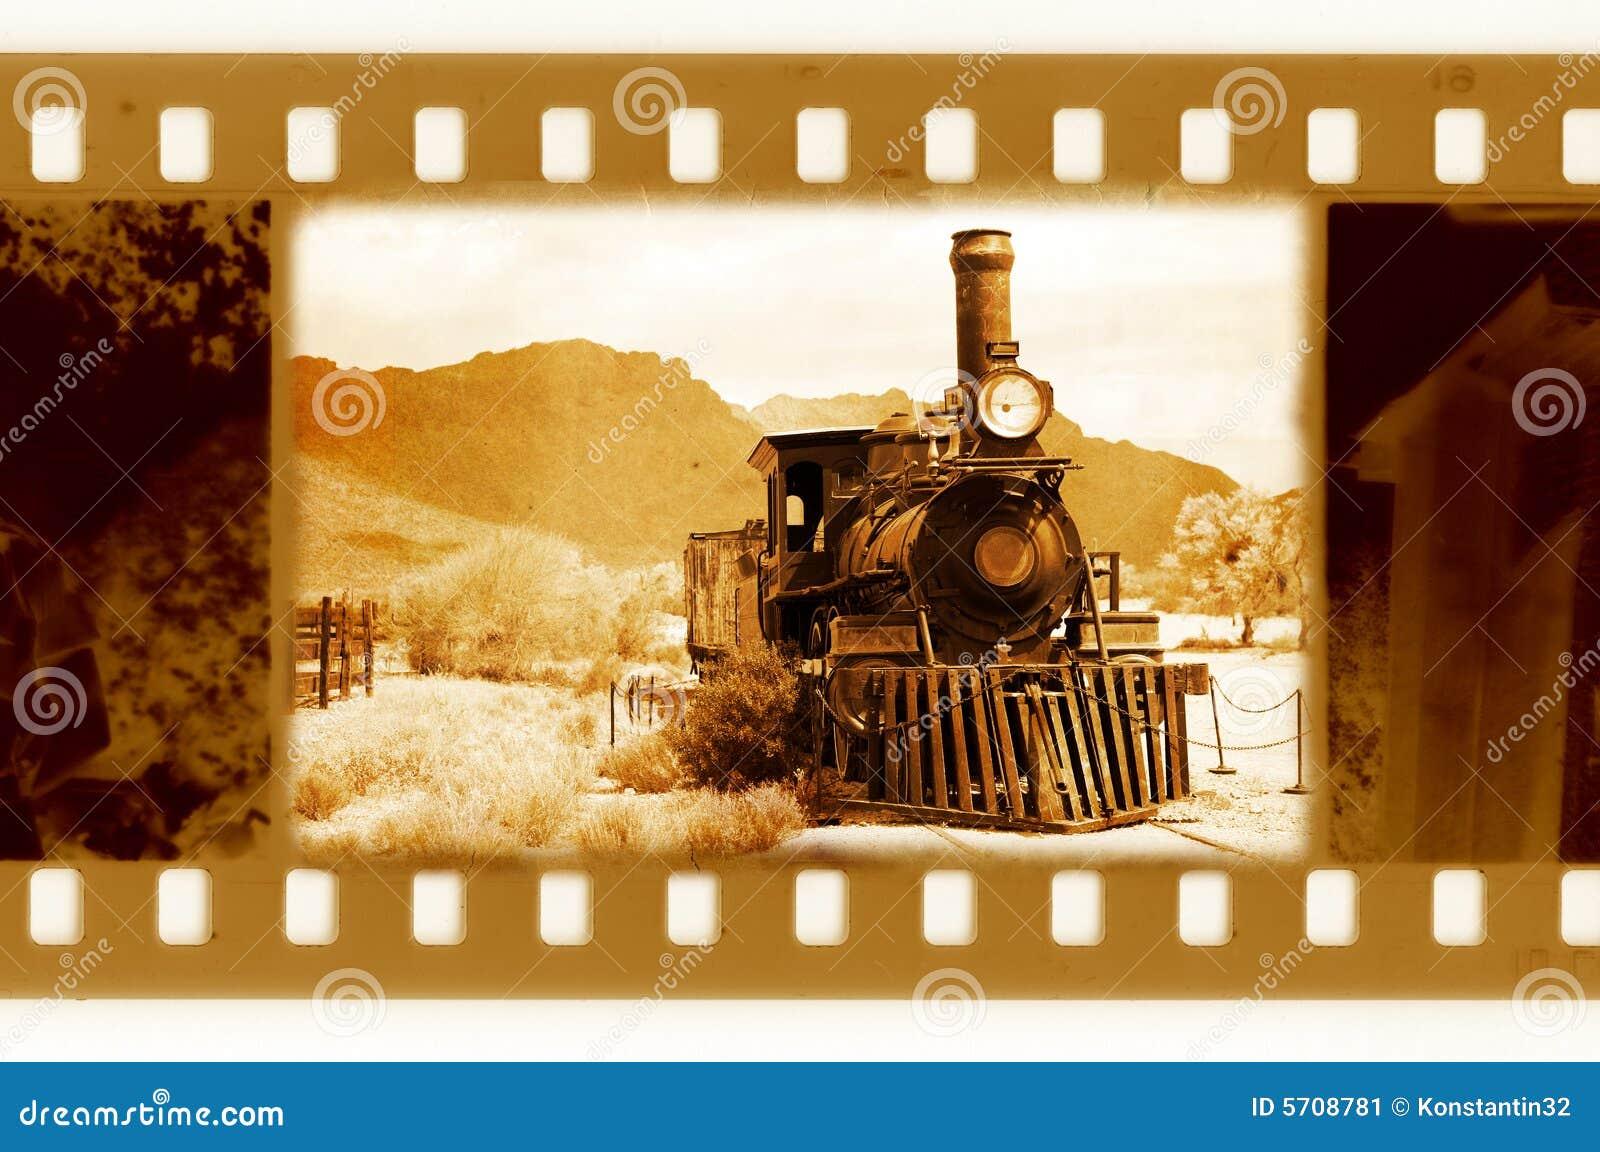 Old Photo Border Vector